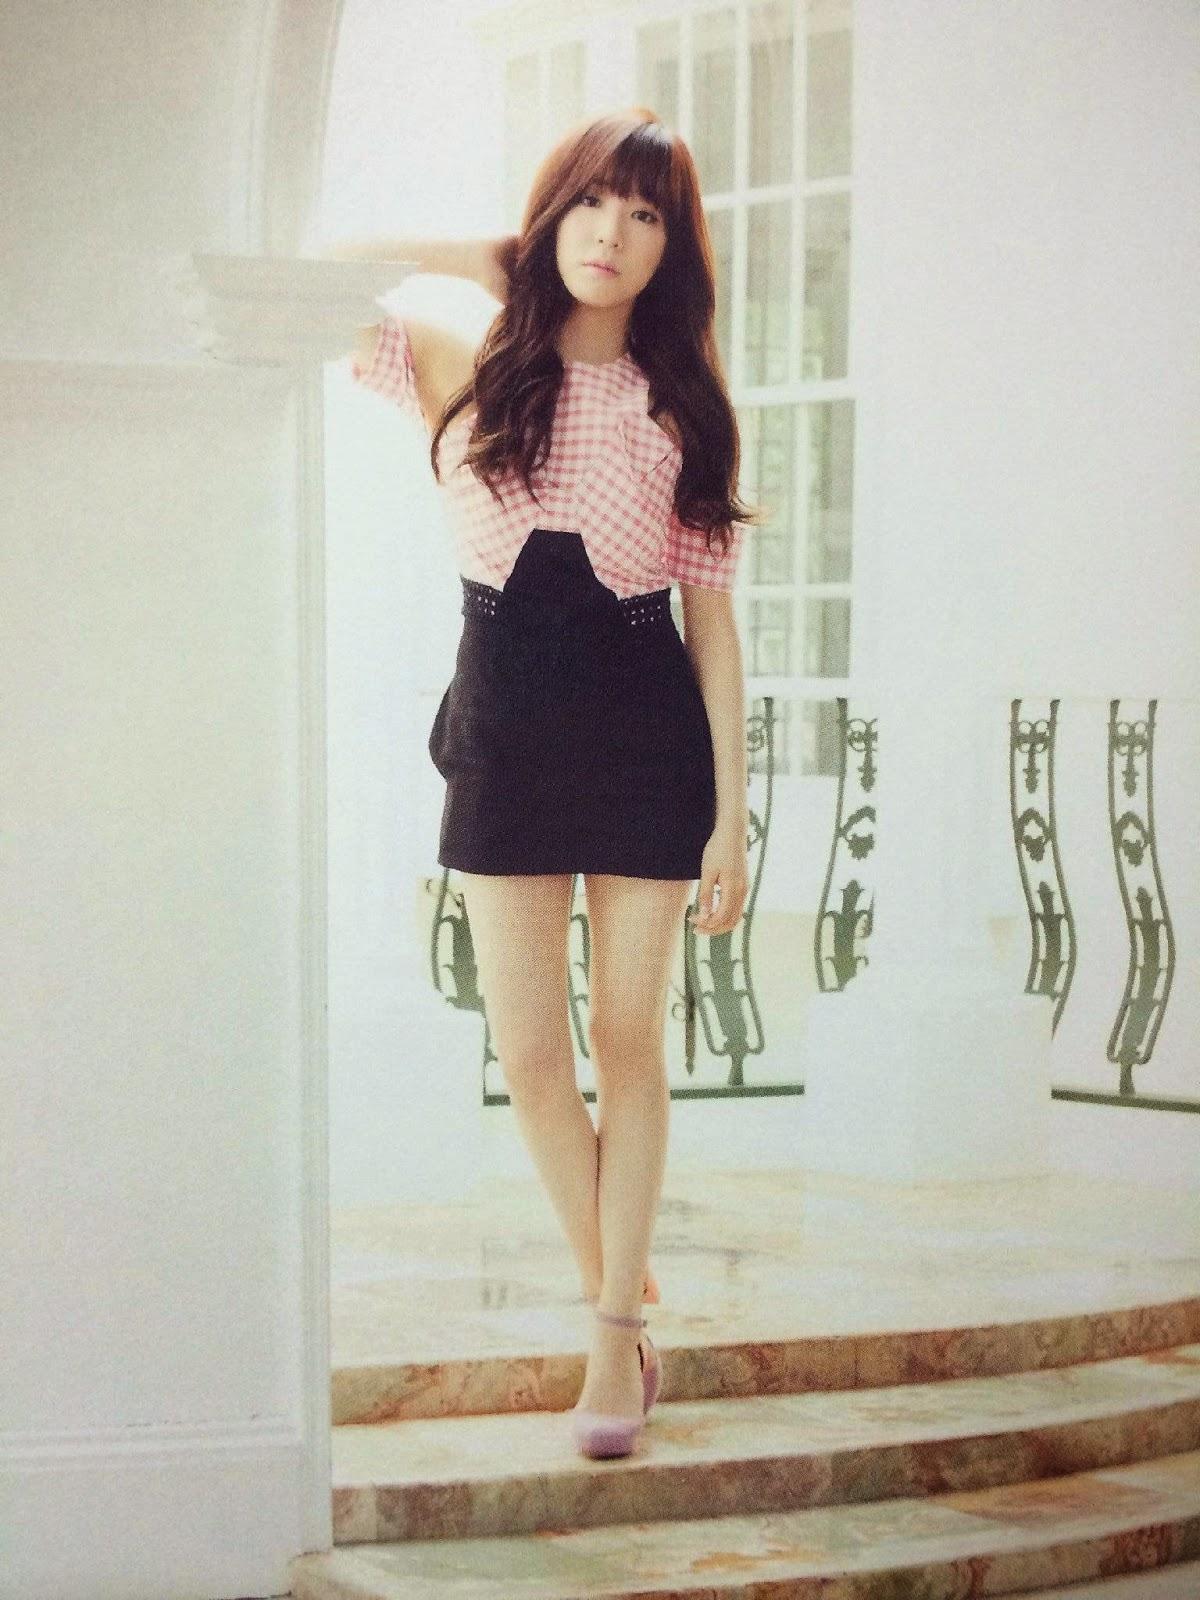 SNSD Tiffany (티파니; ティファニー) Girls Generation The Best Scan Photos 6